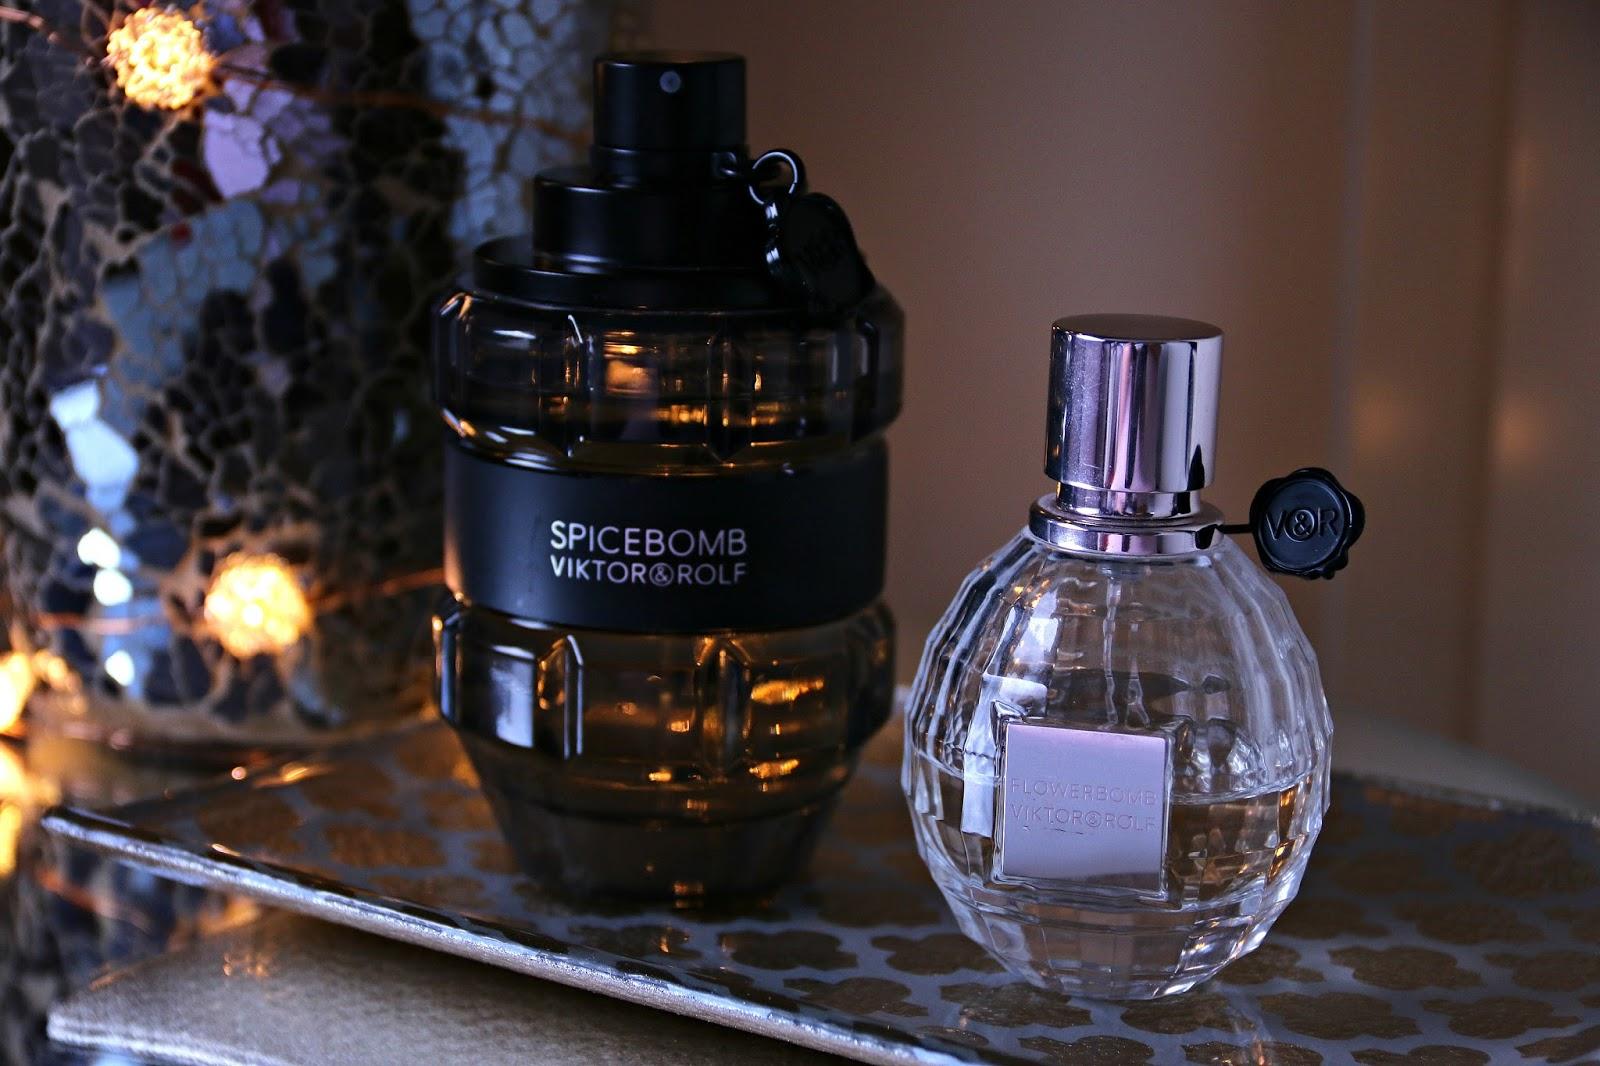 Viktor & Rolf Spicebomb and Flowerbomb Fragrance Perfume Image